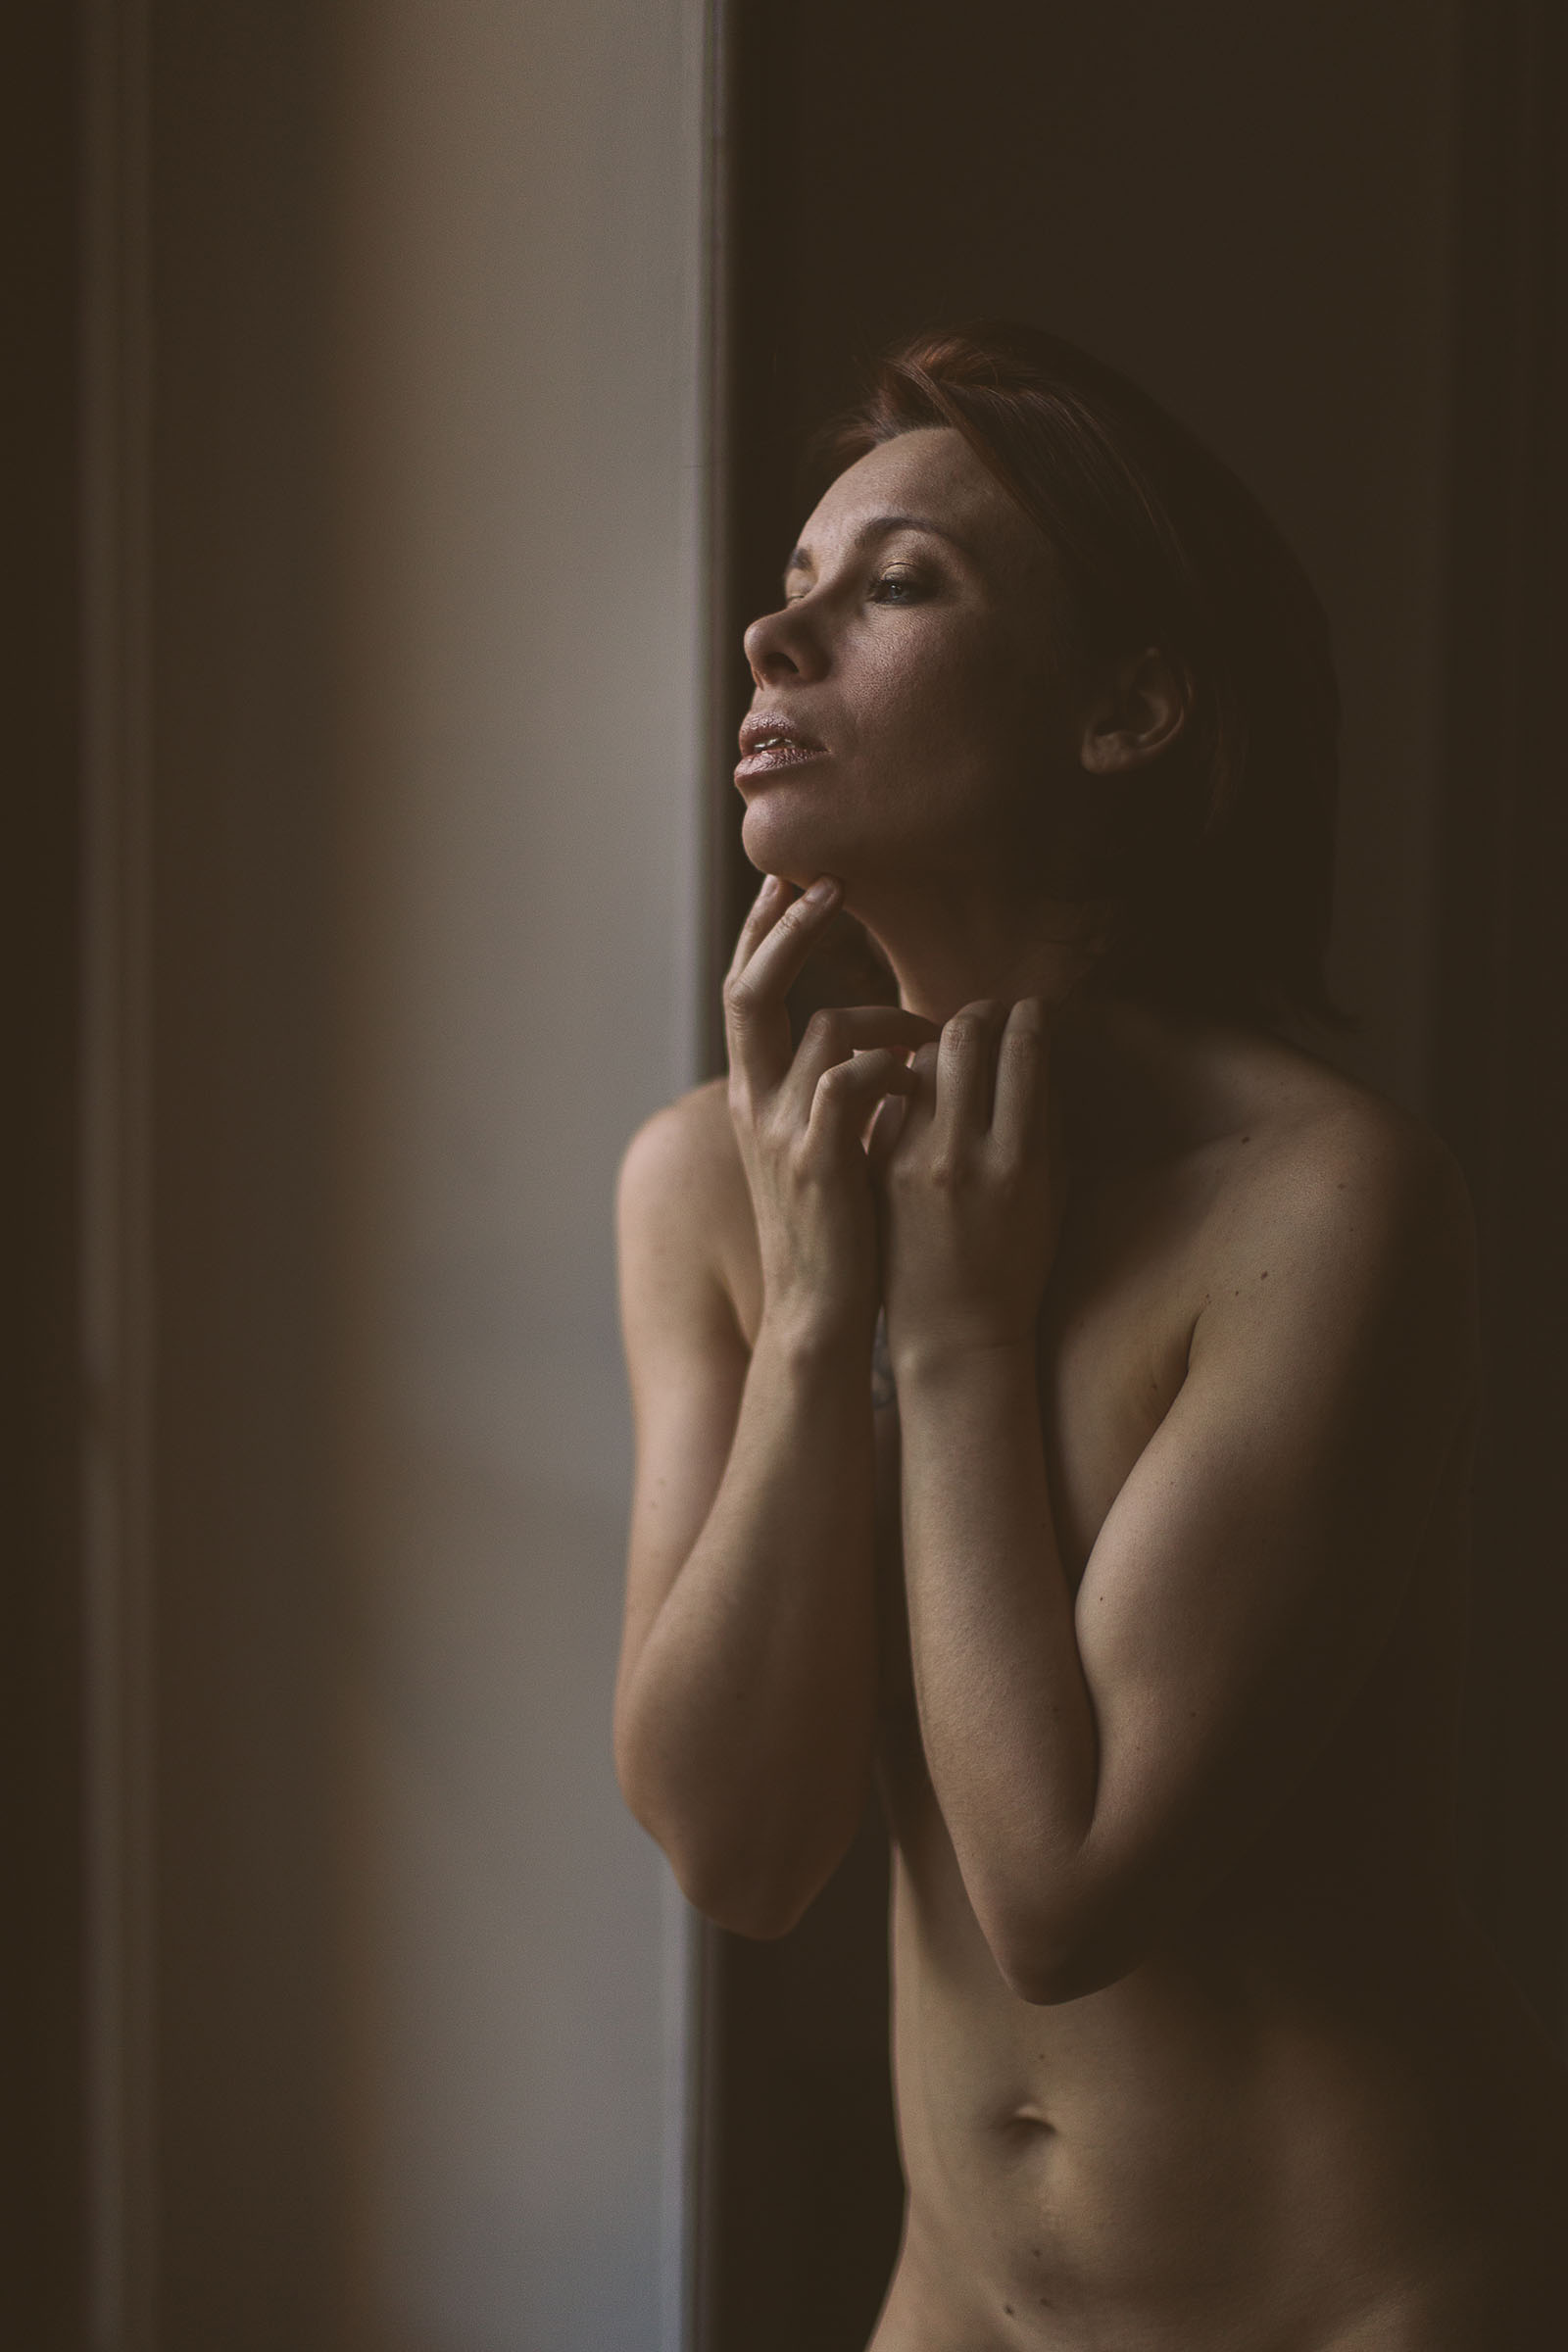 Femme seule 03